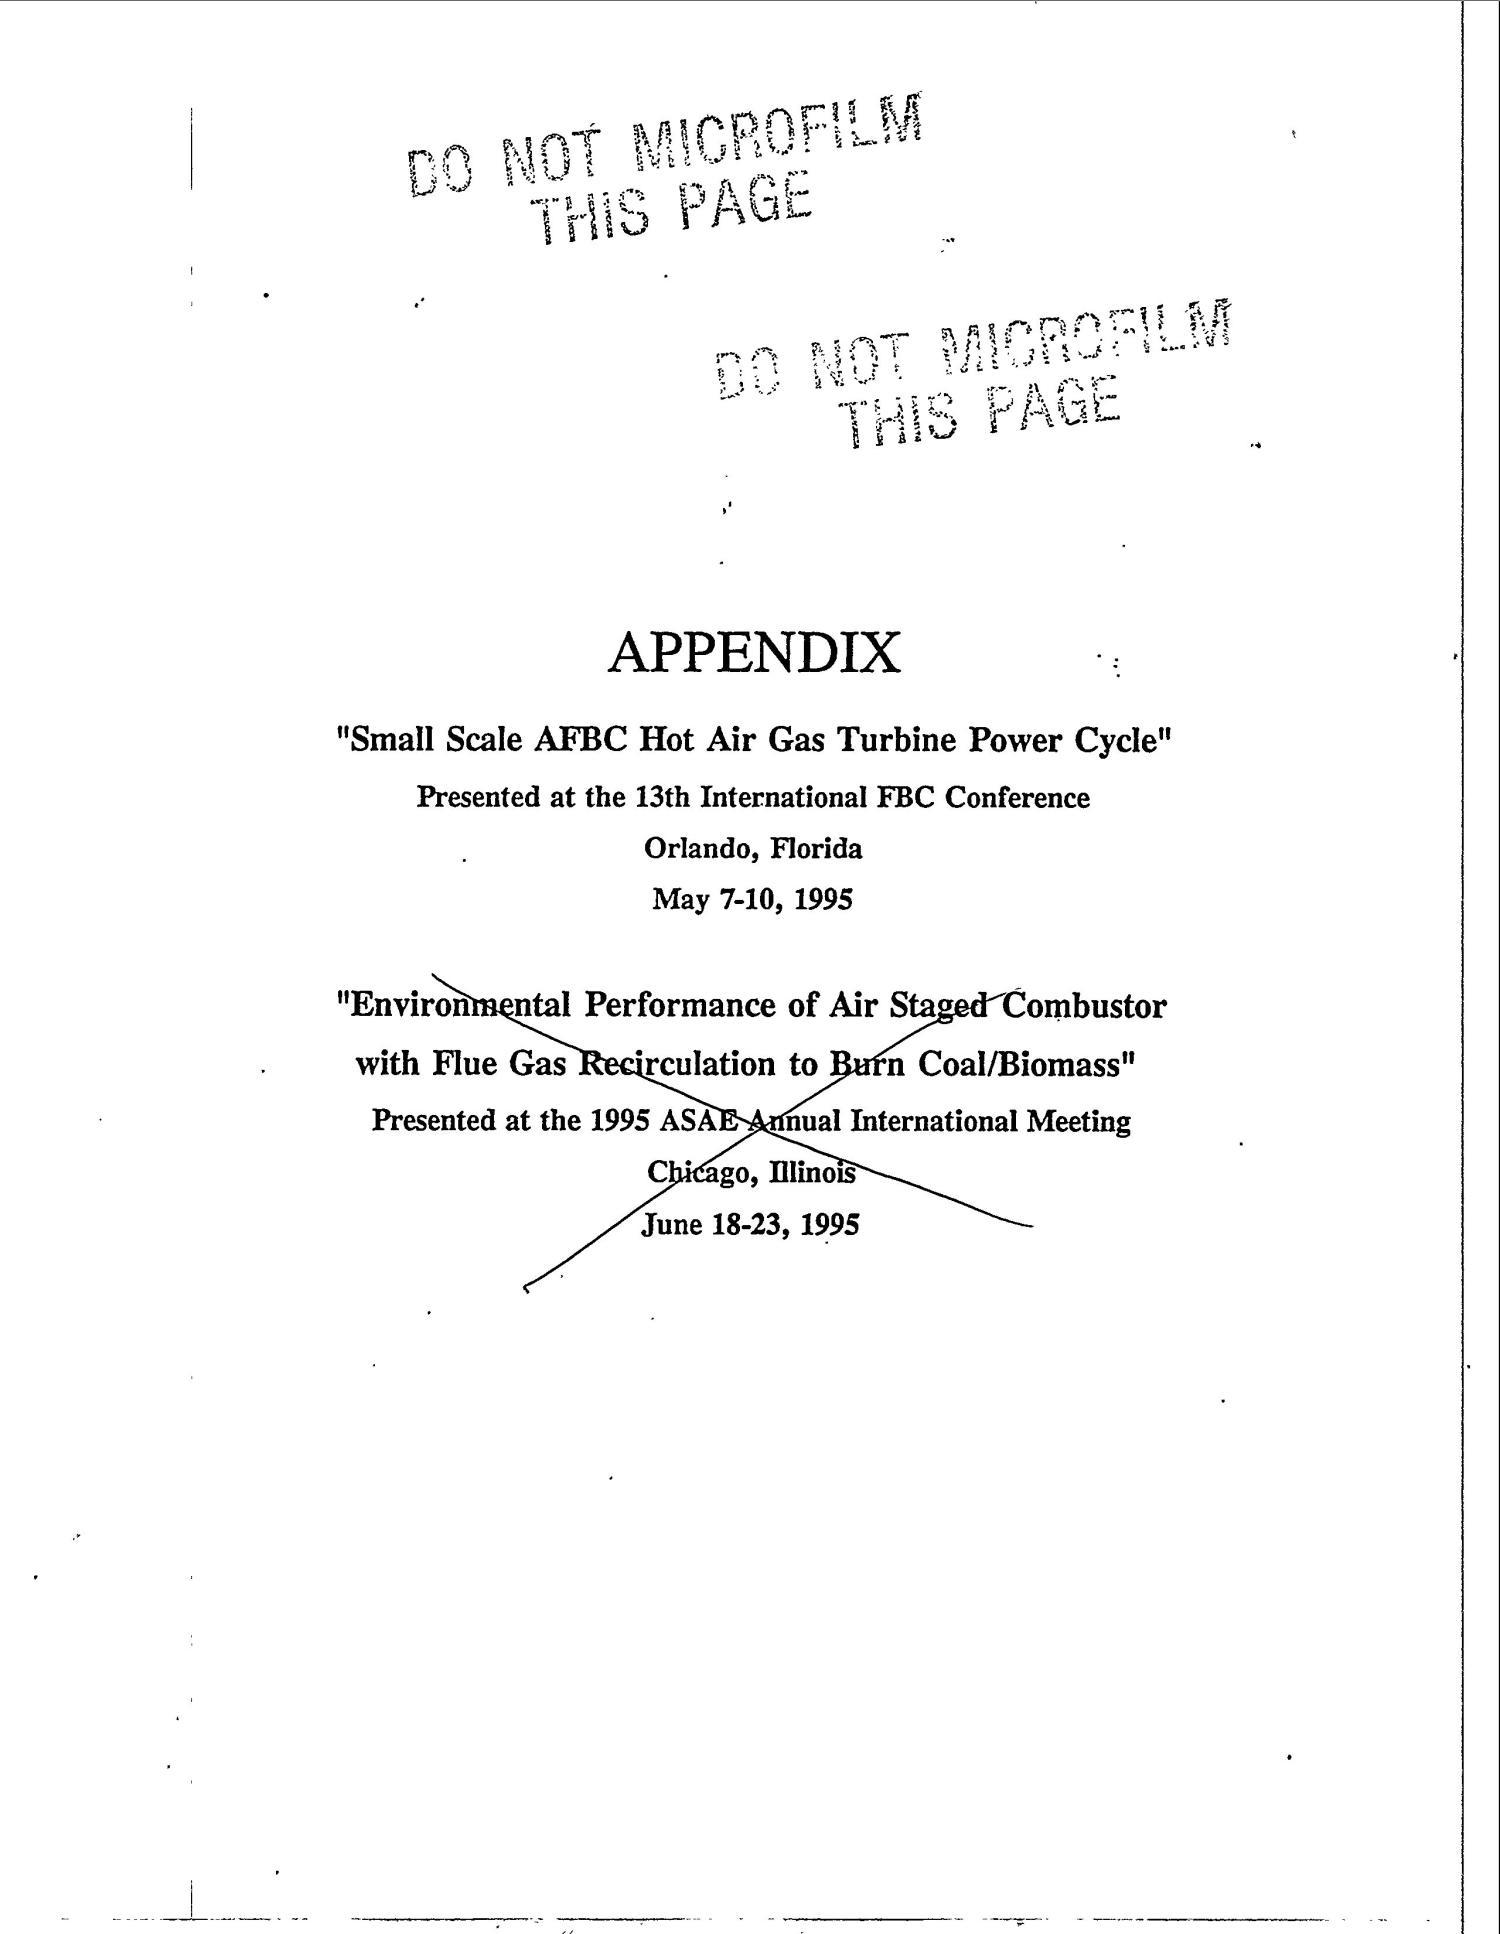 Small scale AFBC hot air gas turbine power cycle Digital Library